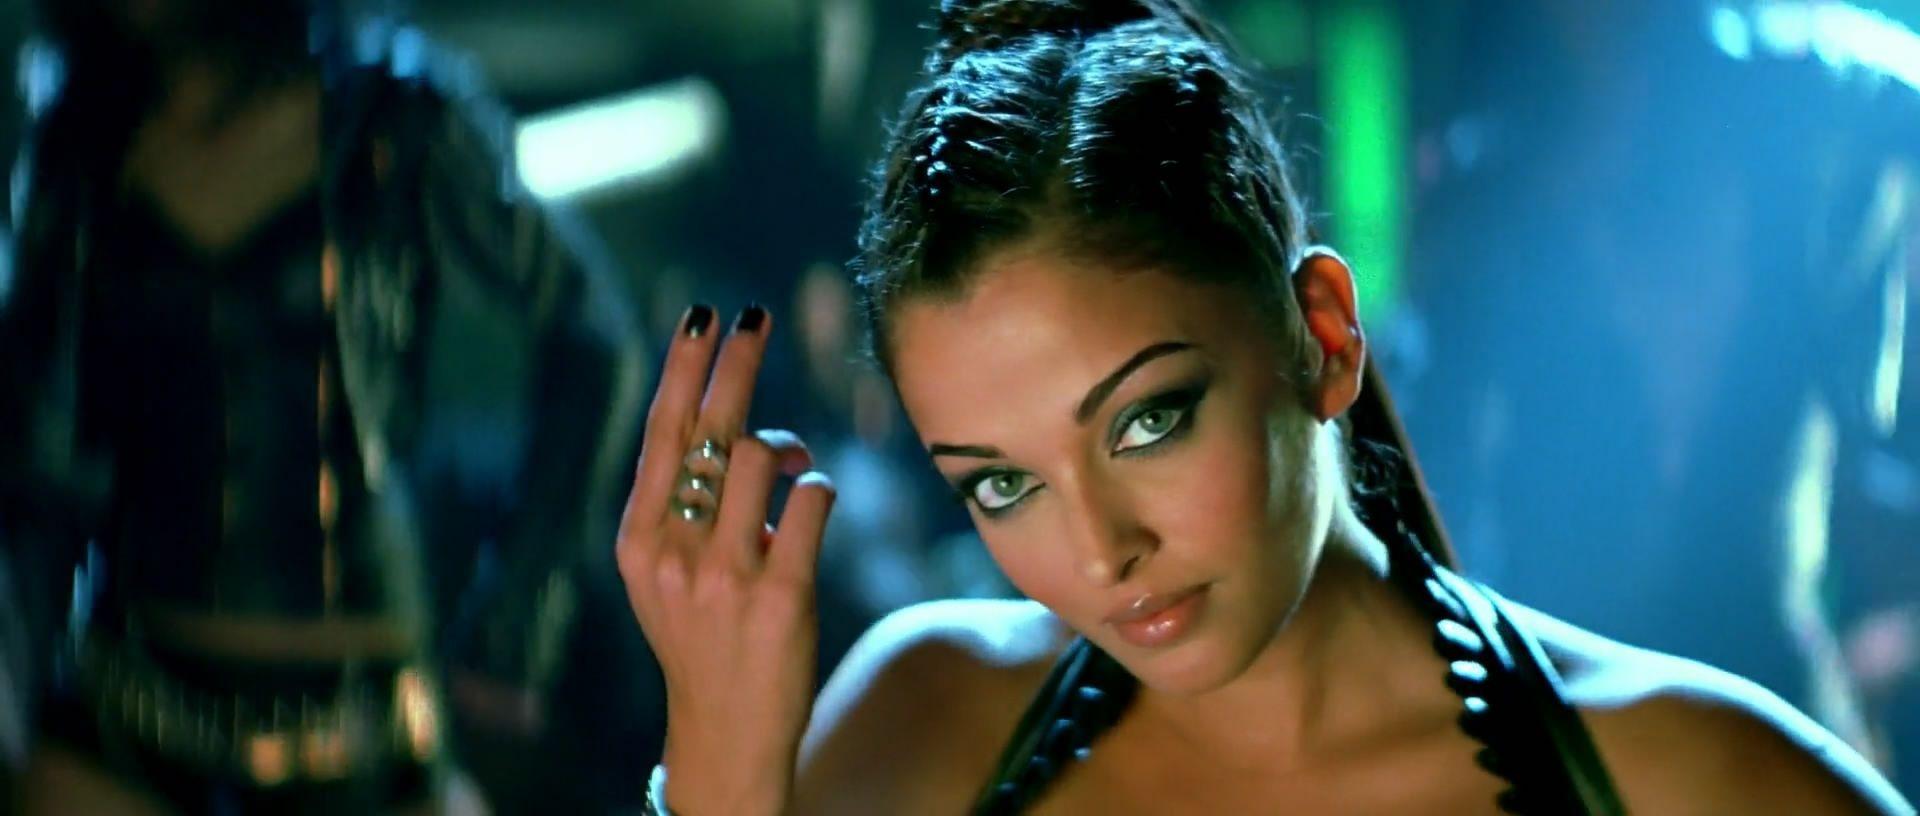 Dhoom 2 Mp3 Song Dhoom 2 Aishwarya Rai